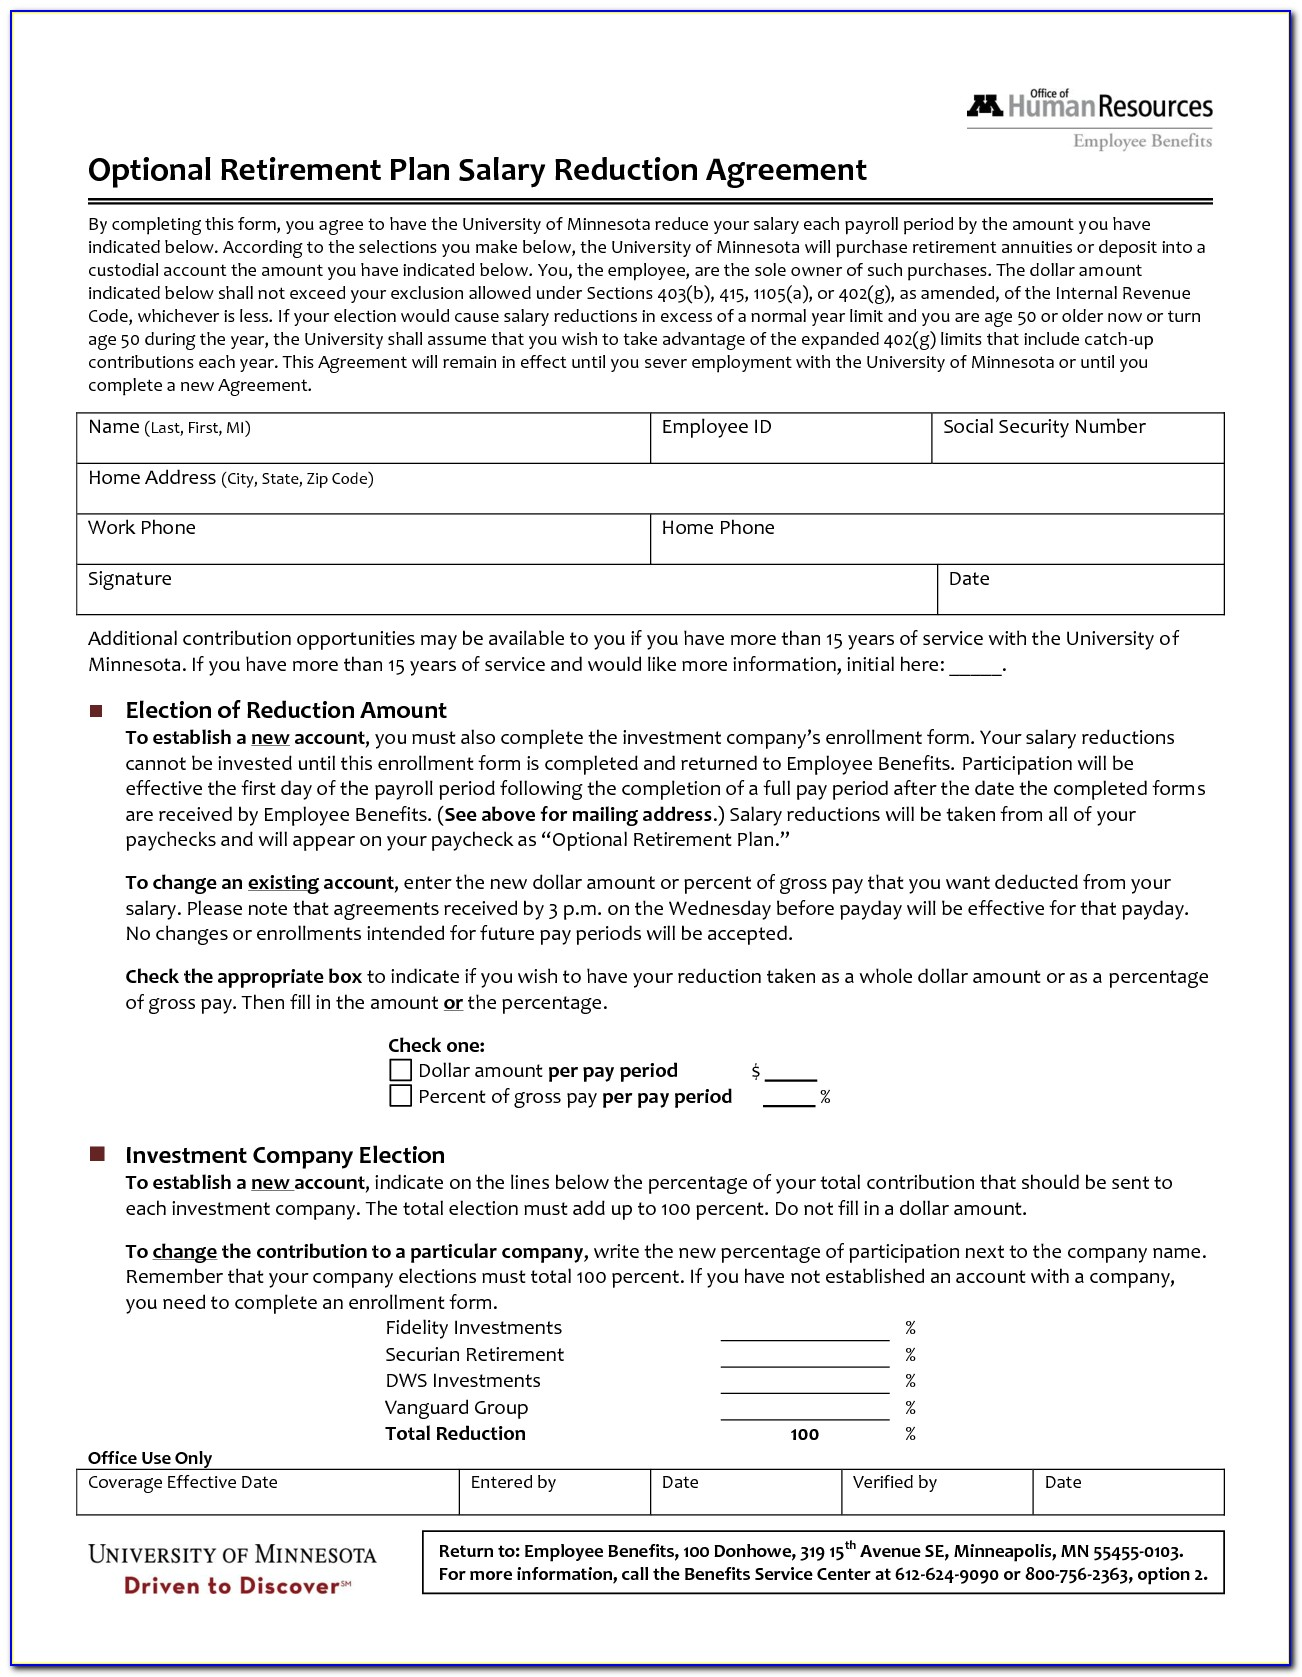 Minnesota Purchase Agreement Form Free